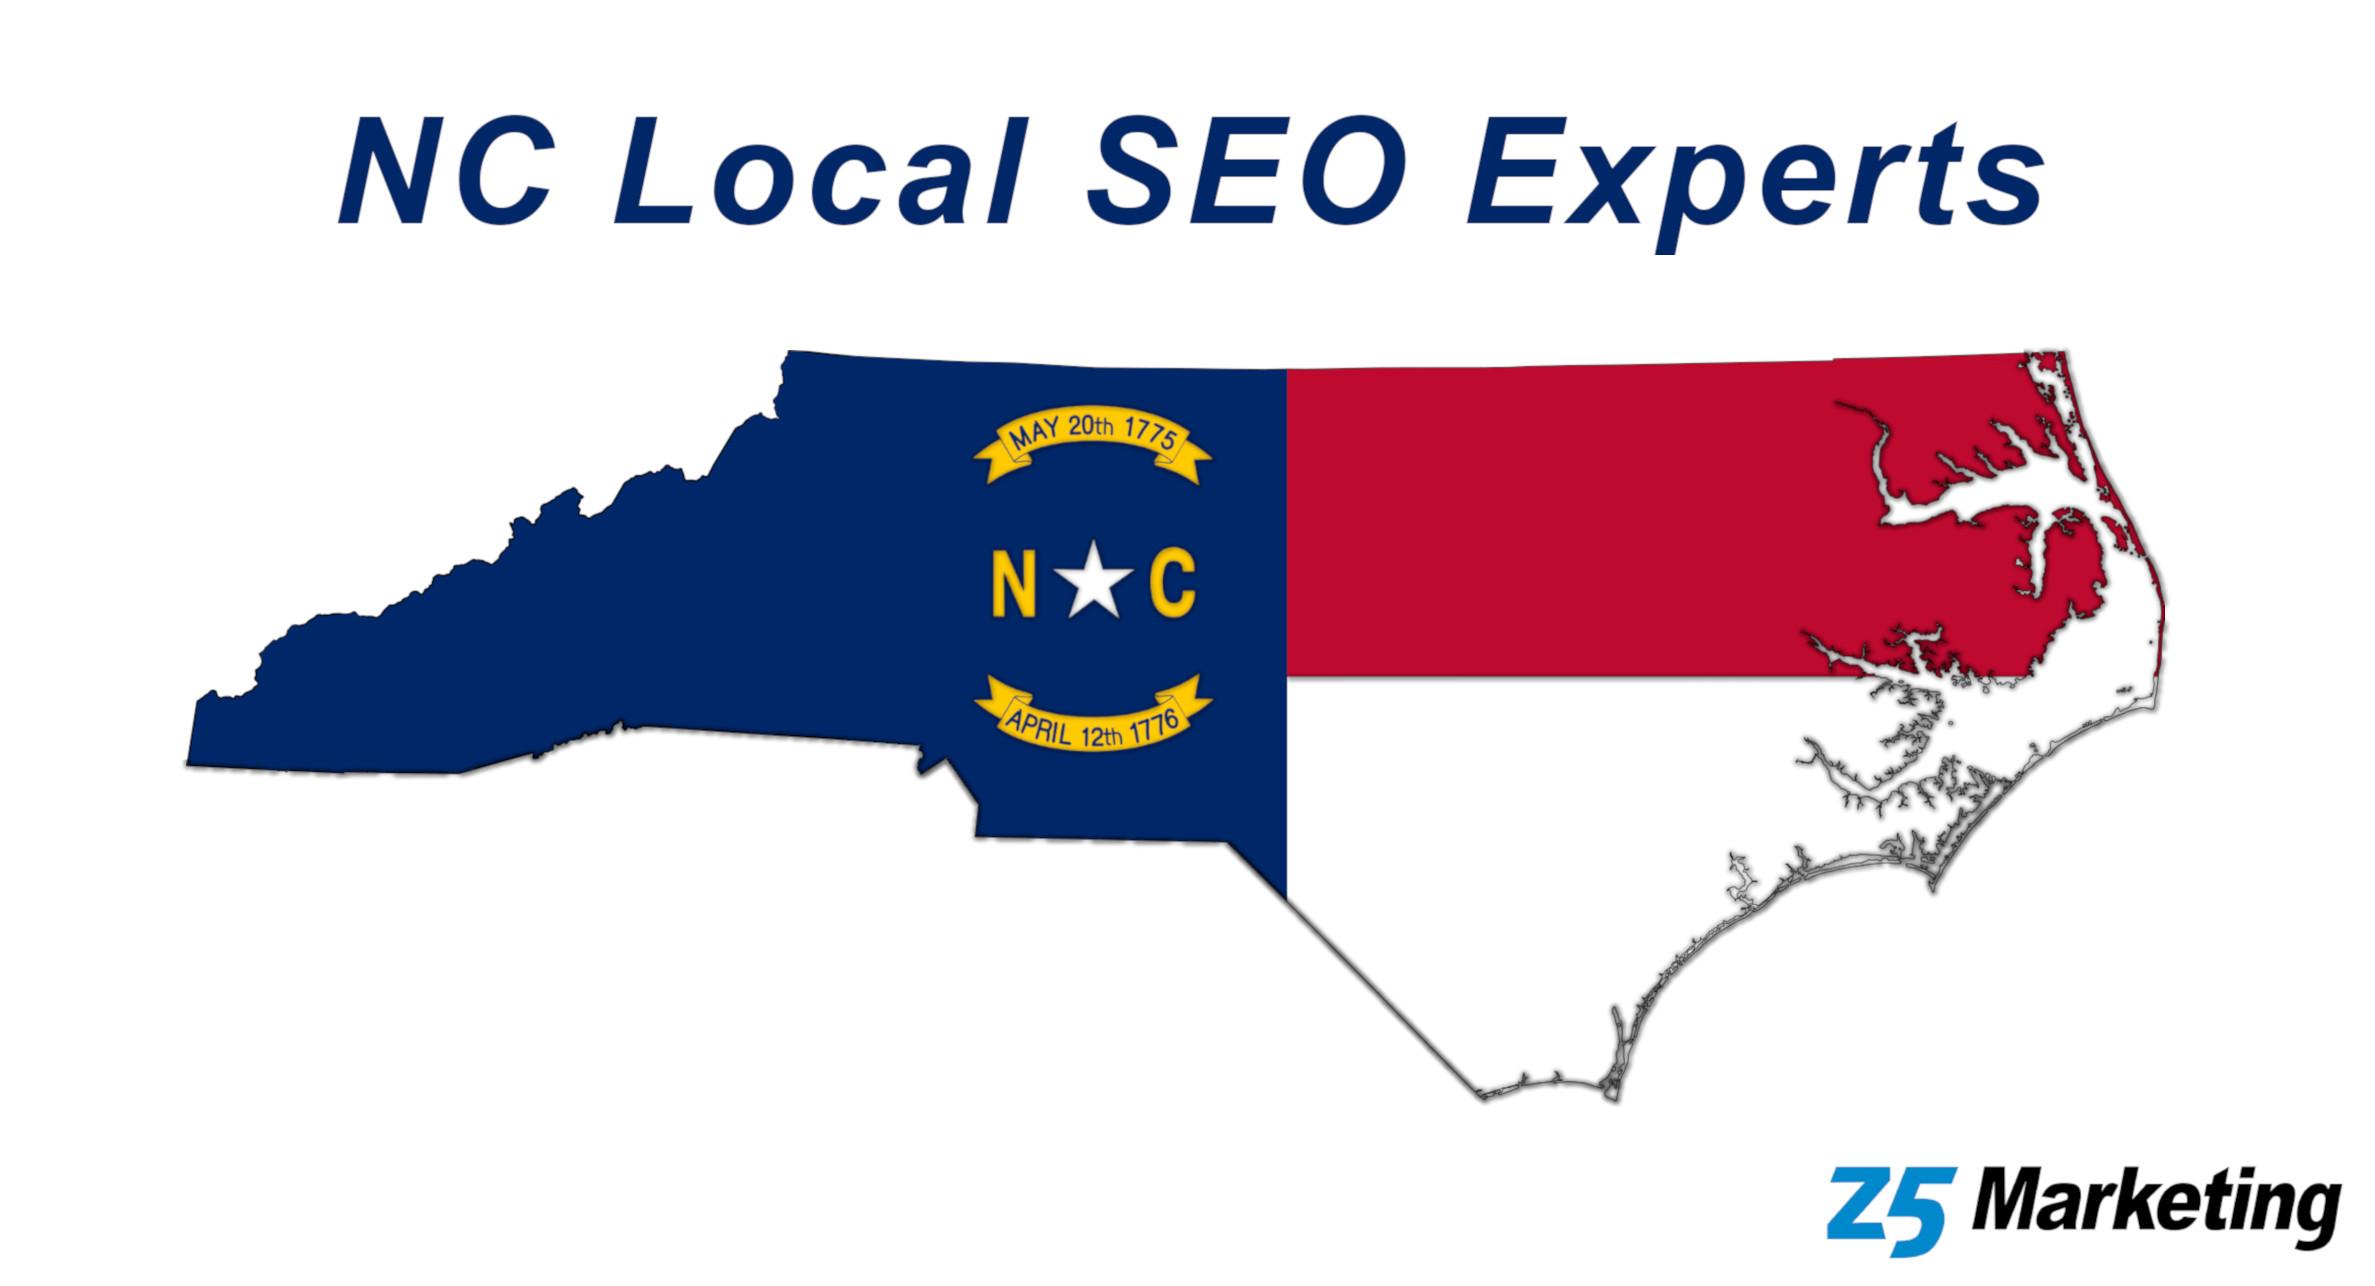 NC SEO experts